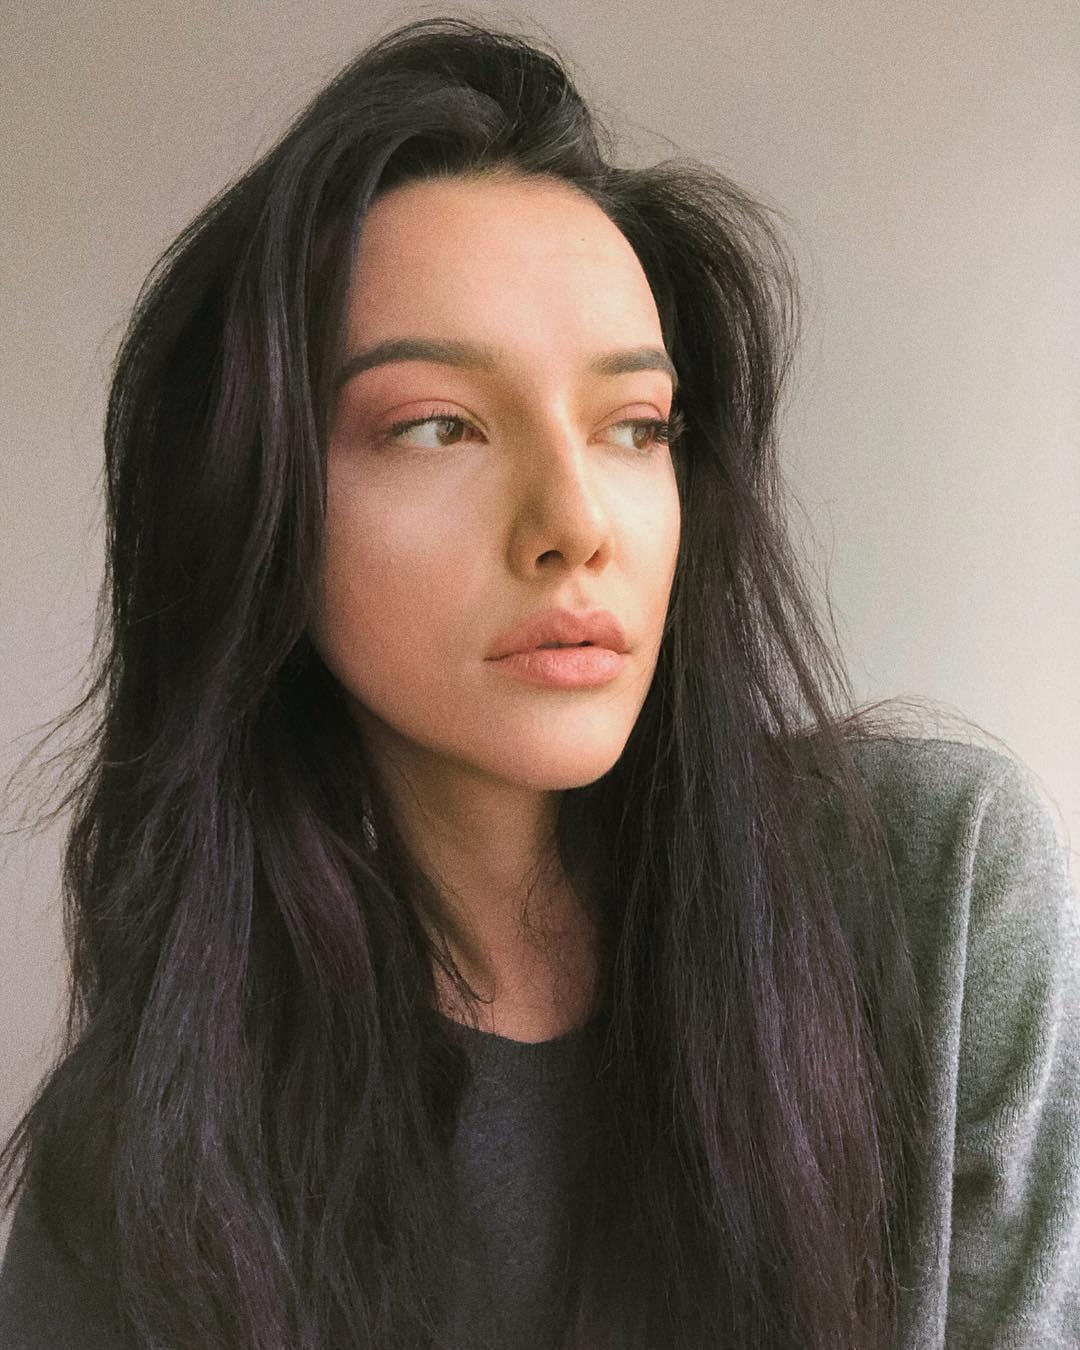 NEW PORN: Lylo Ifşa Nude Duygu Atil Twitch Streamer Leaked